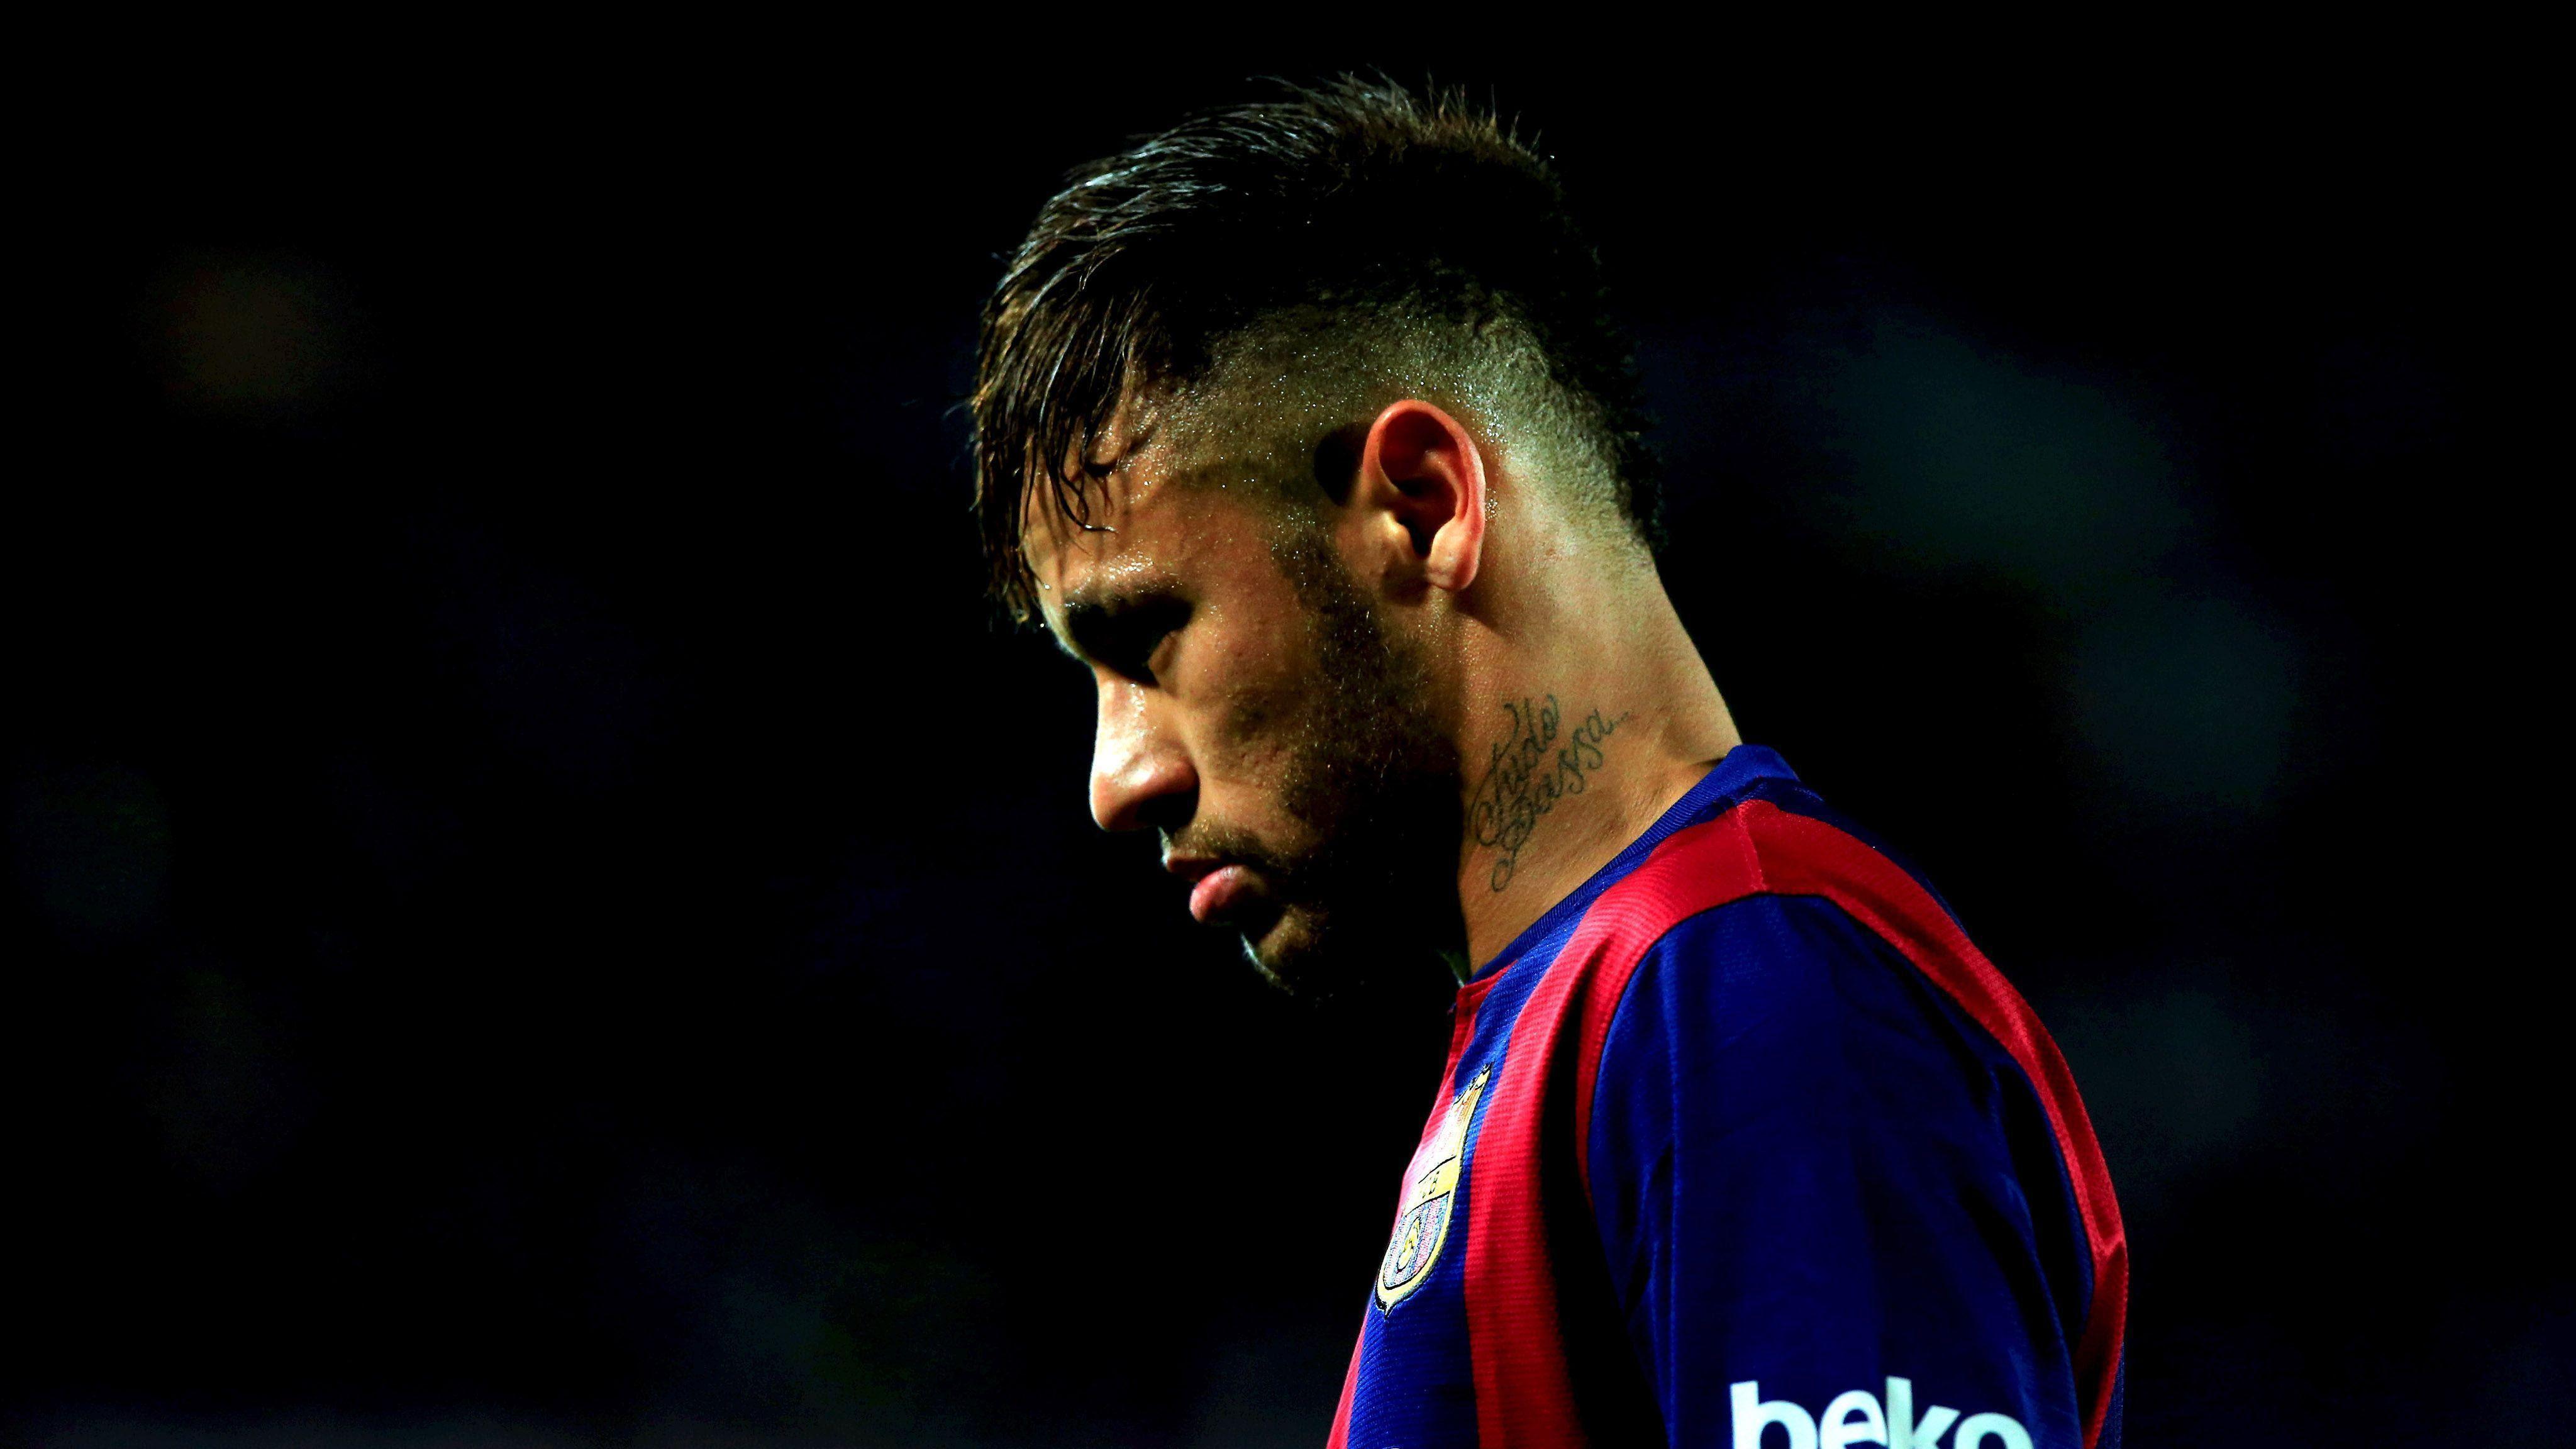 Neymar Wallpapers 2016 HD - Wallpaper Cave